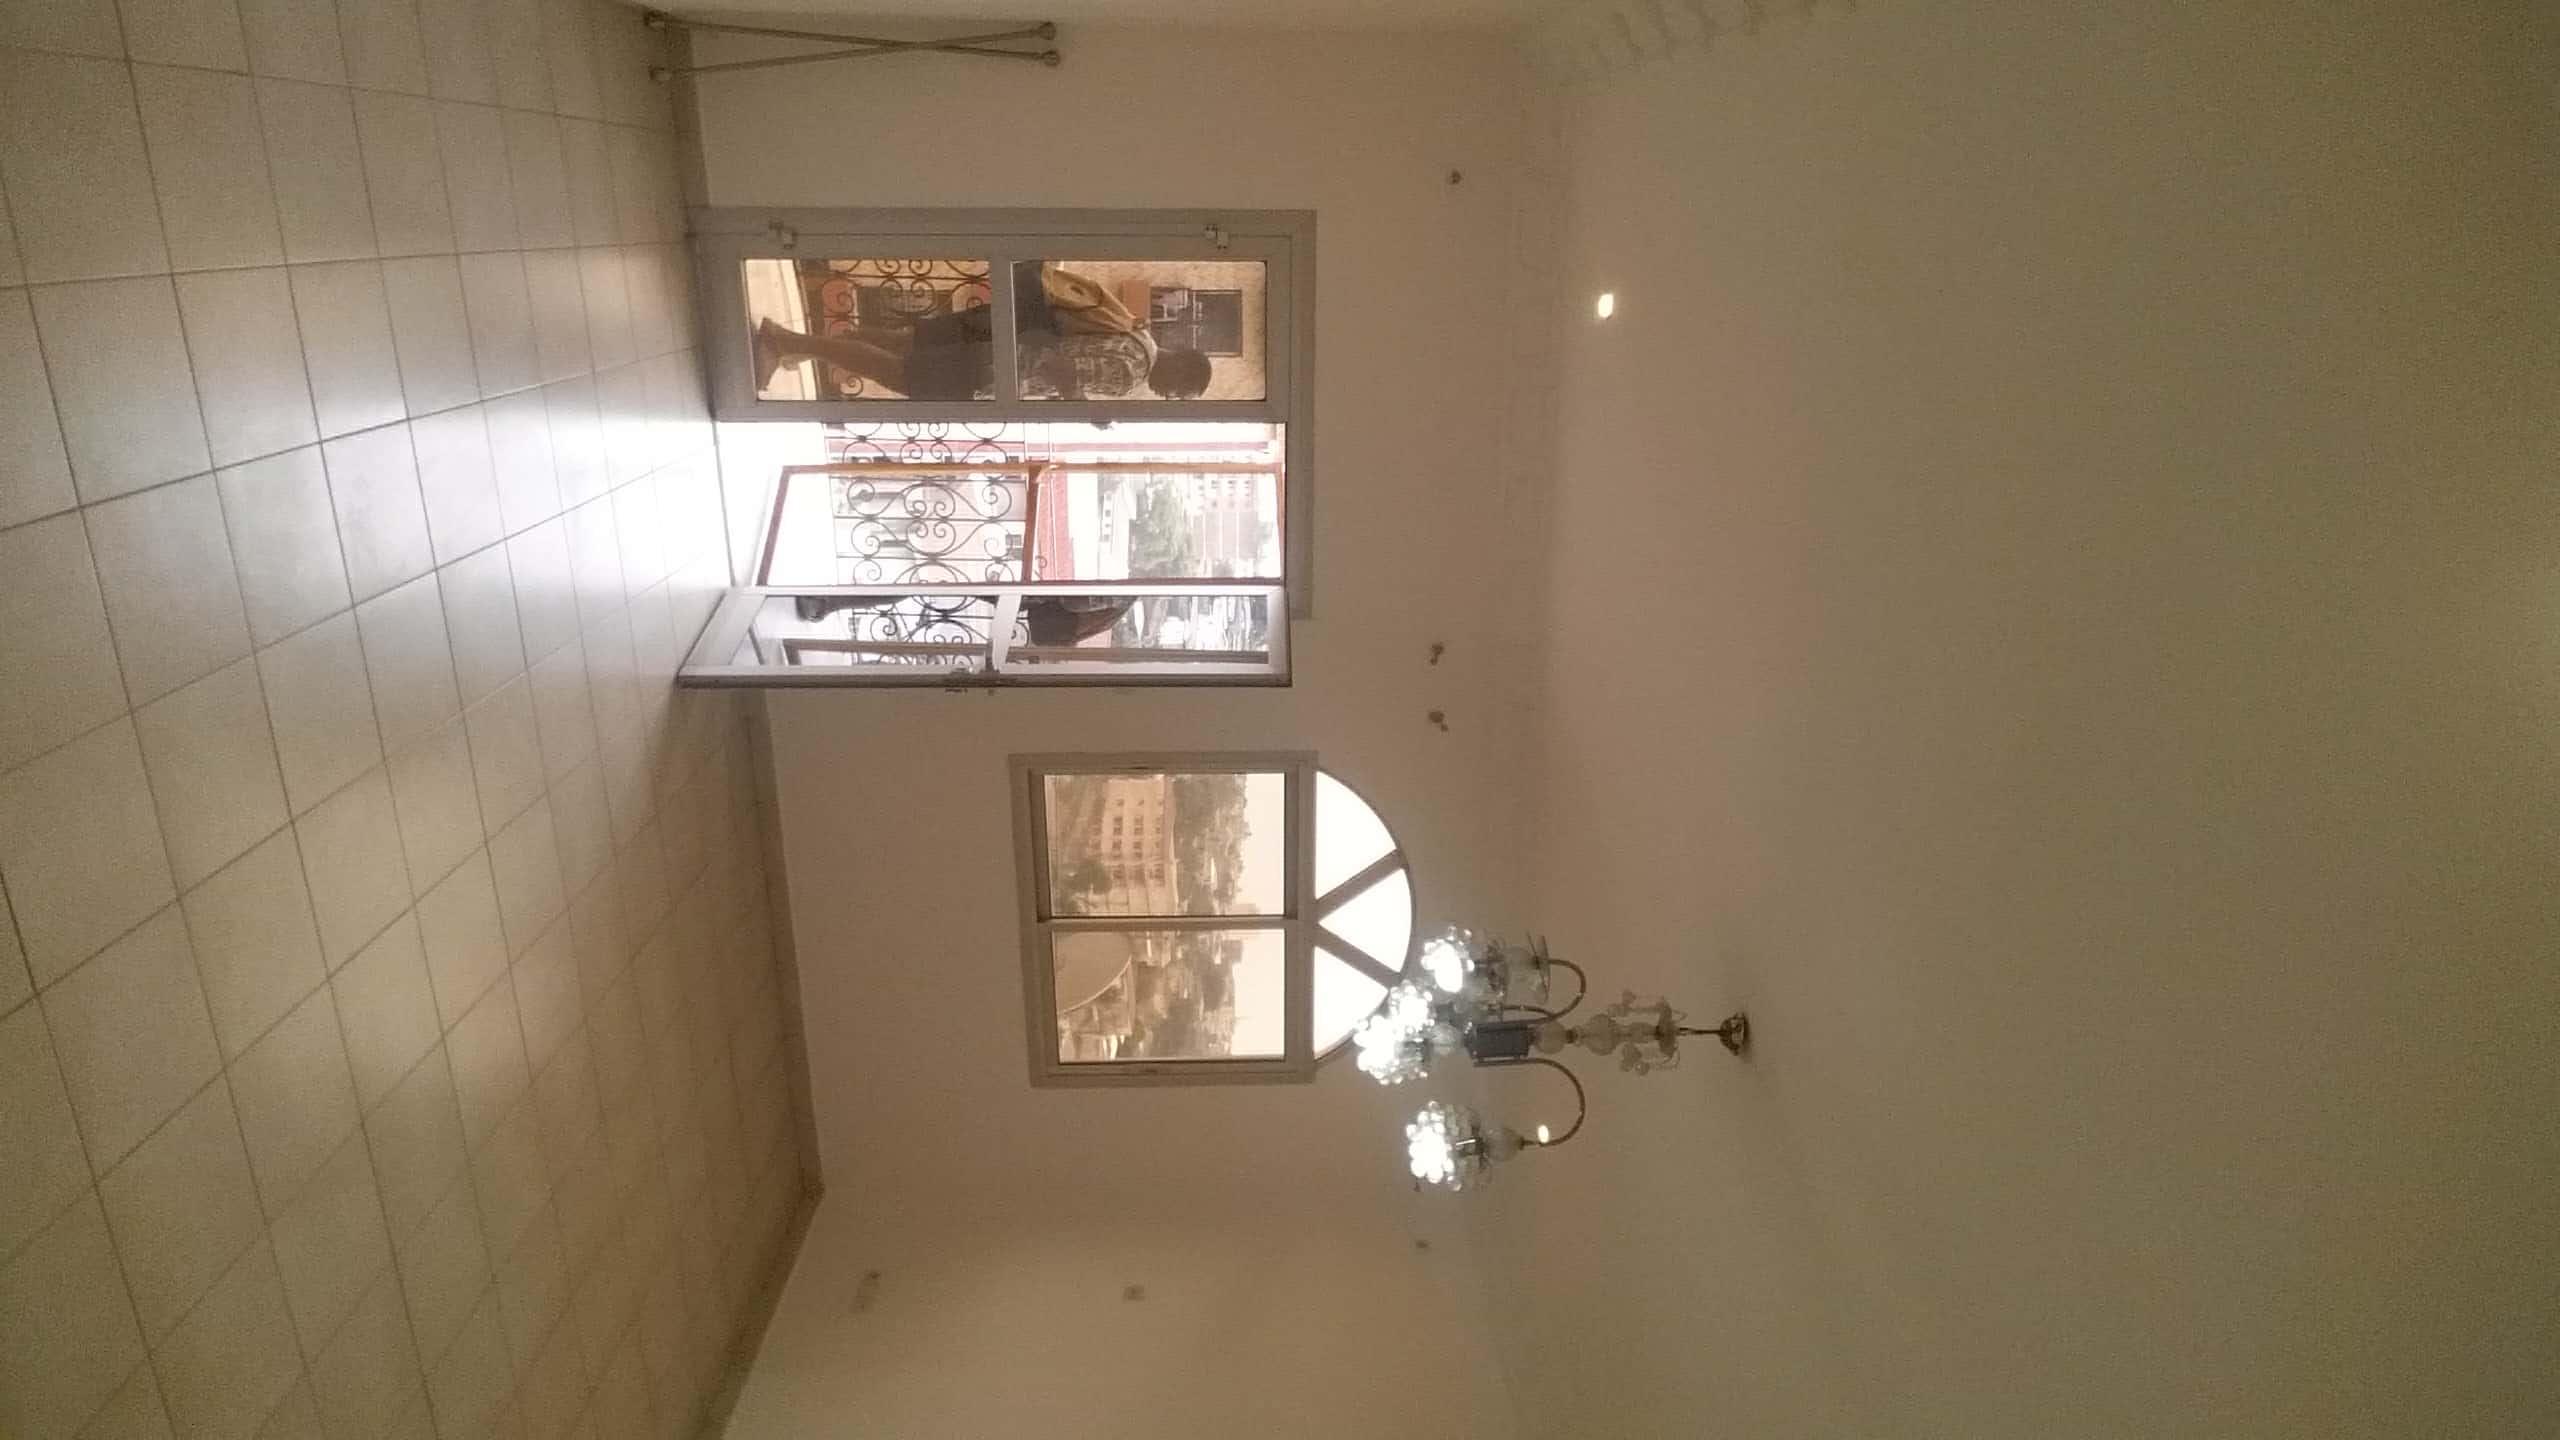 Apartment to rent - Yaoundé, Mfandena, Omnisport - 1 living room(s), 2 bedroom(s), 3 bathroom(s) - 200 000 FCFA / month